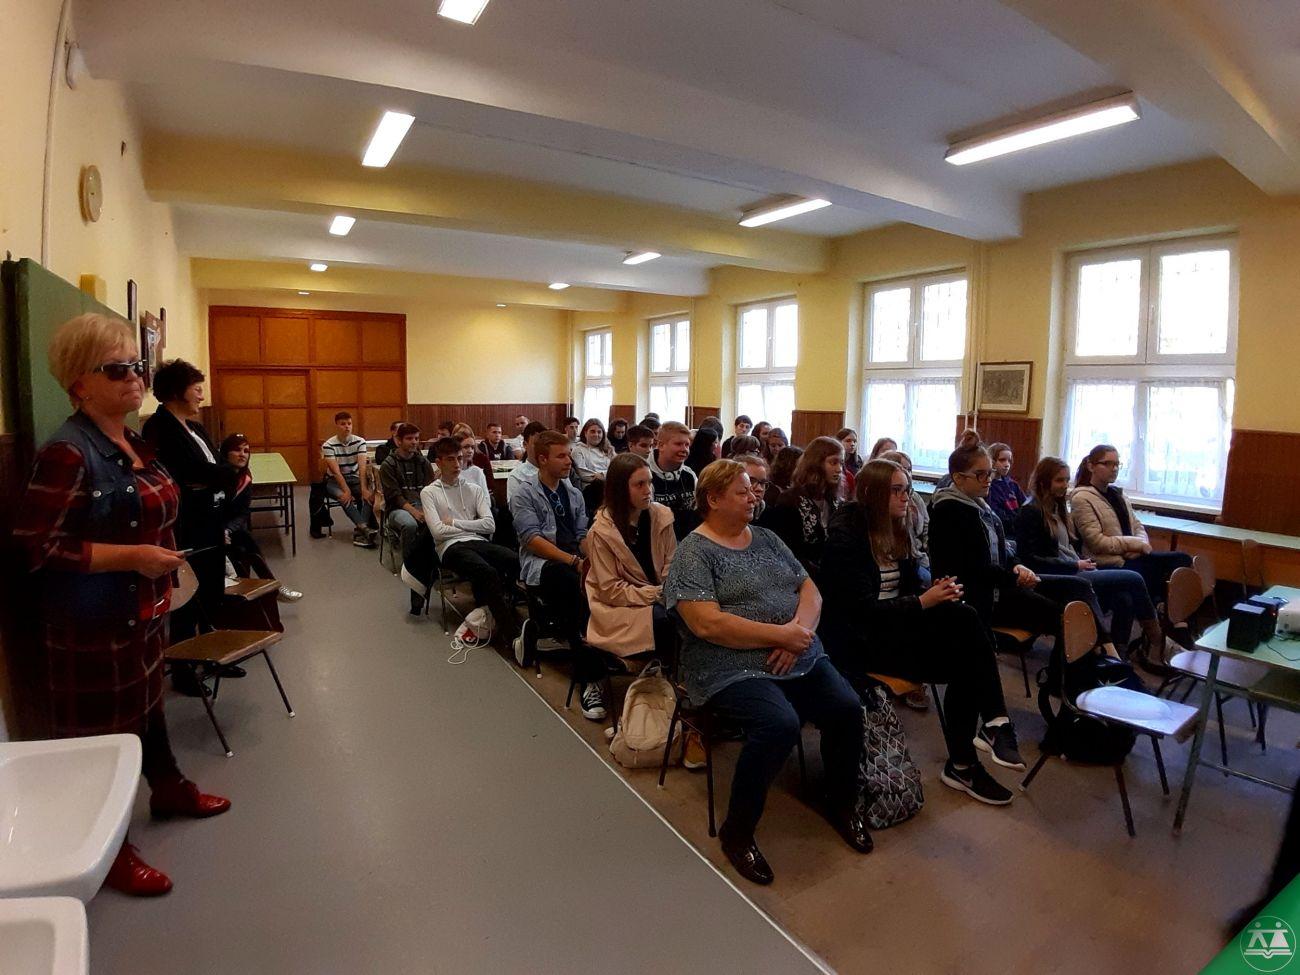 Strokovna-ekskurzija-v-Szekesfehervar-2019-003